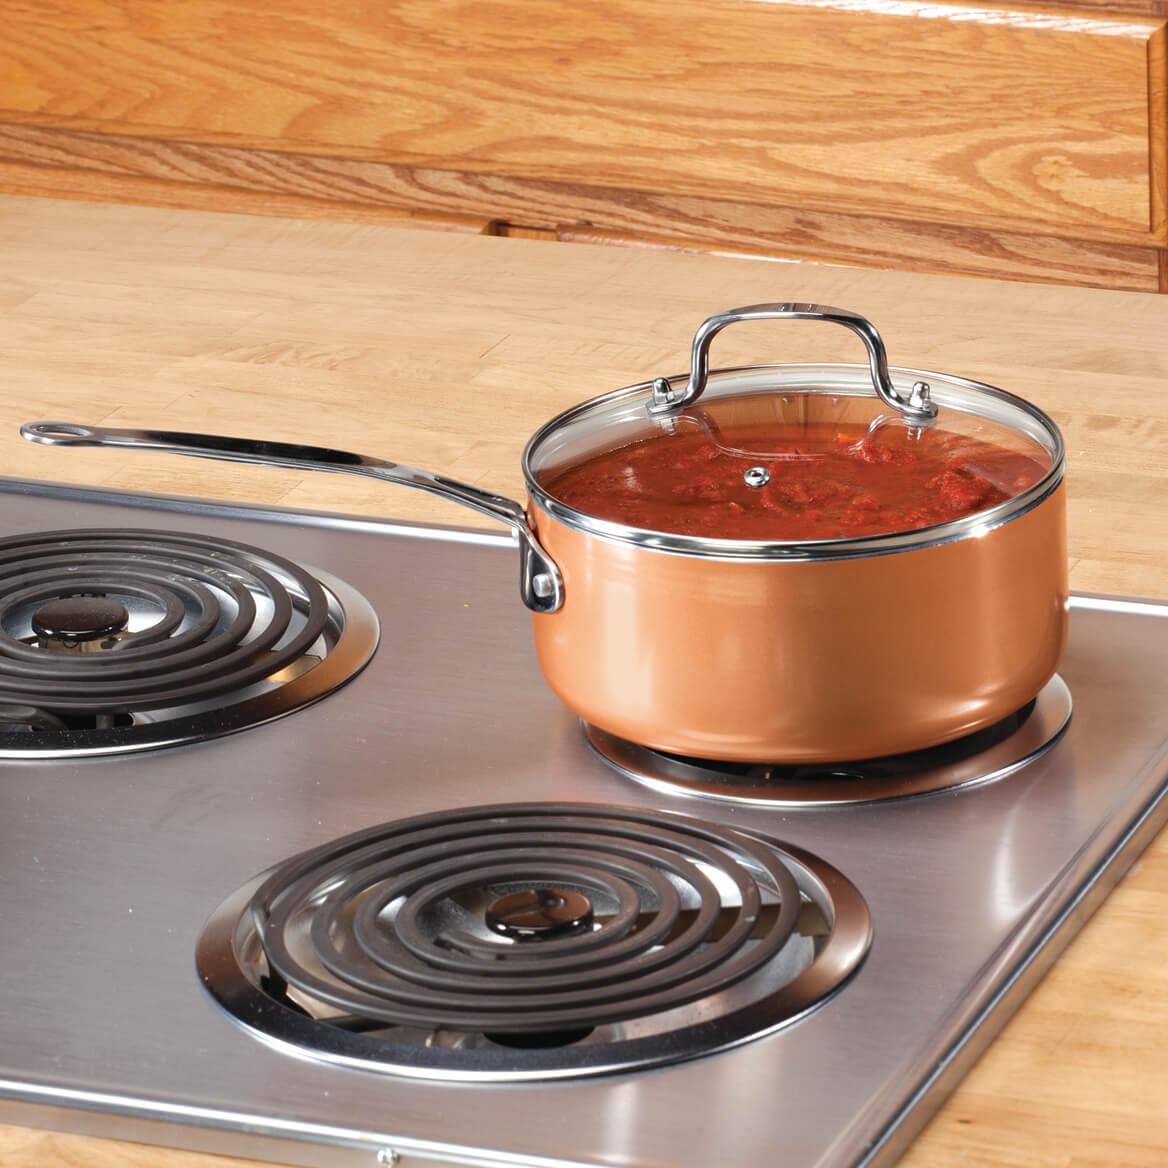 Ceramic Non Stick Sauce Pan With Lid 3 Qt Nonstick Pan